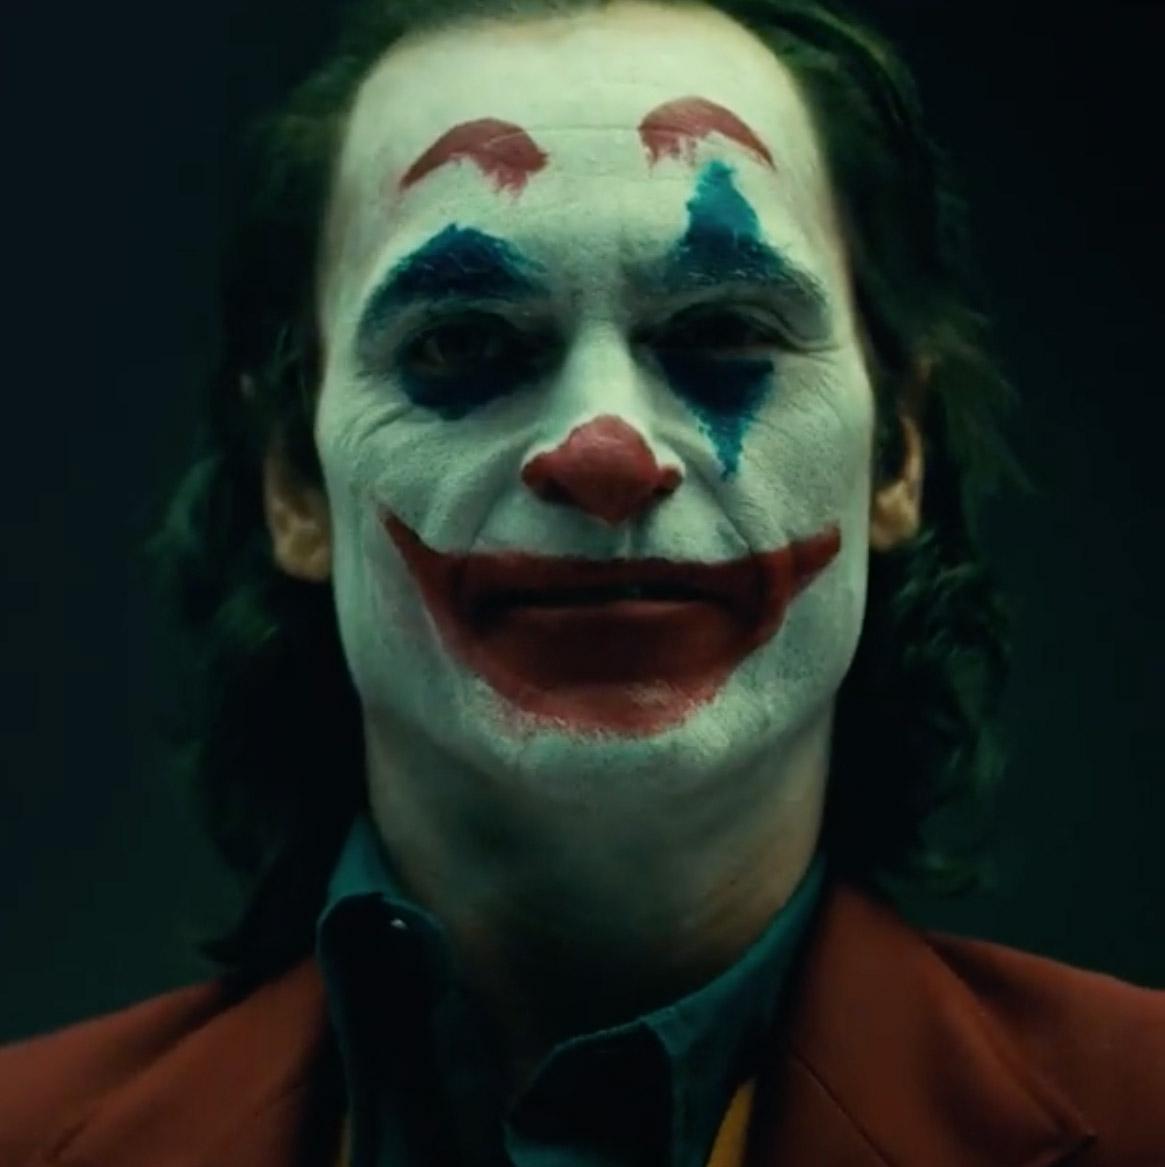 Joker 2019 Wallpapers High Quality Download 1165x1167